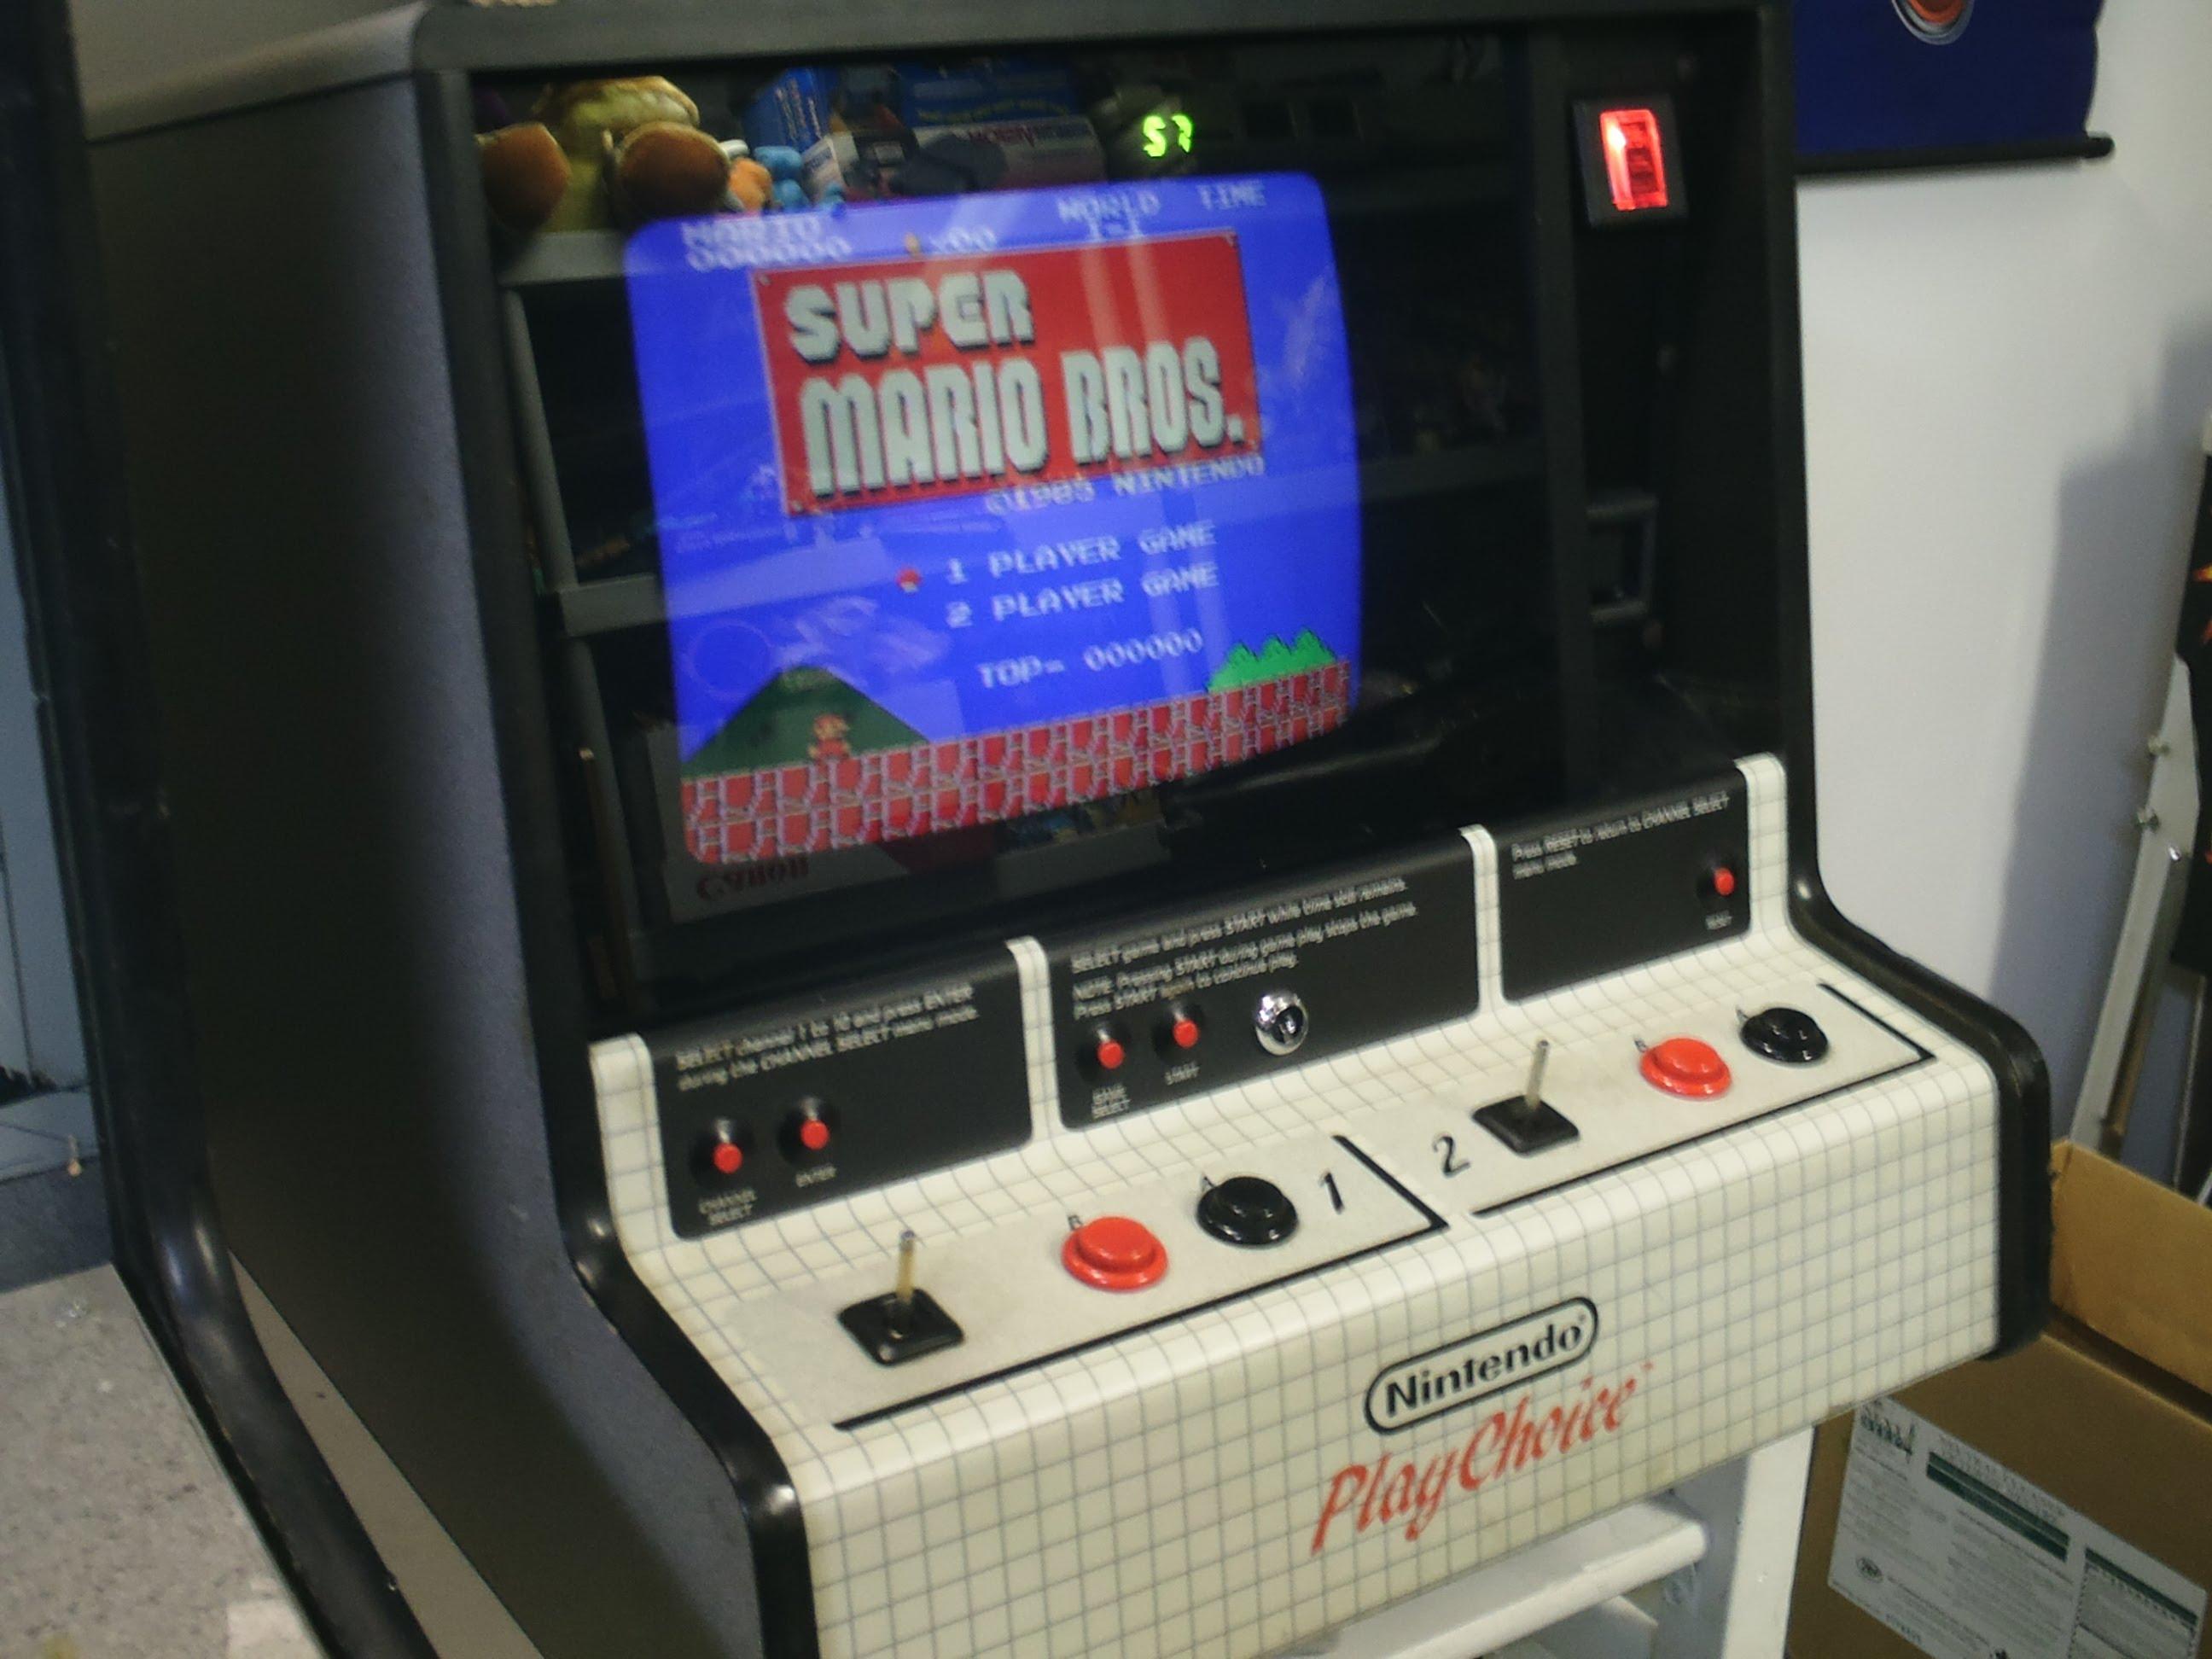 Nintendo PlayChoice 10 Arcade Machine Review - YouTube